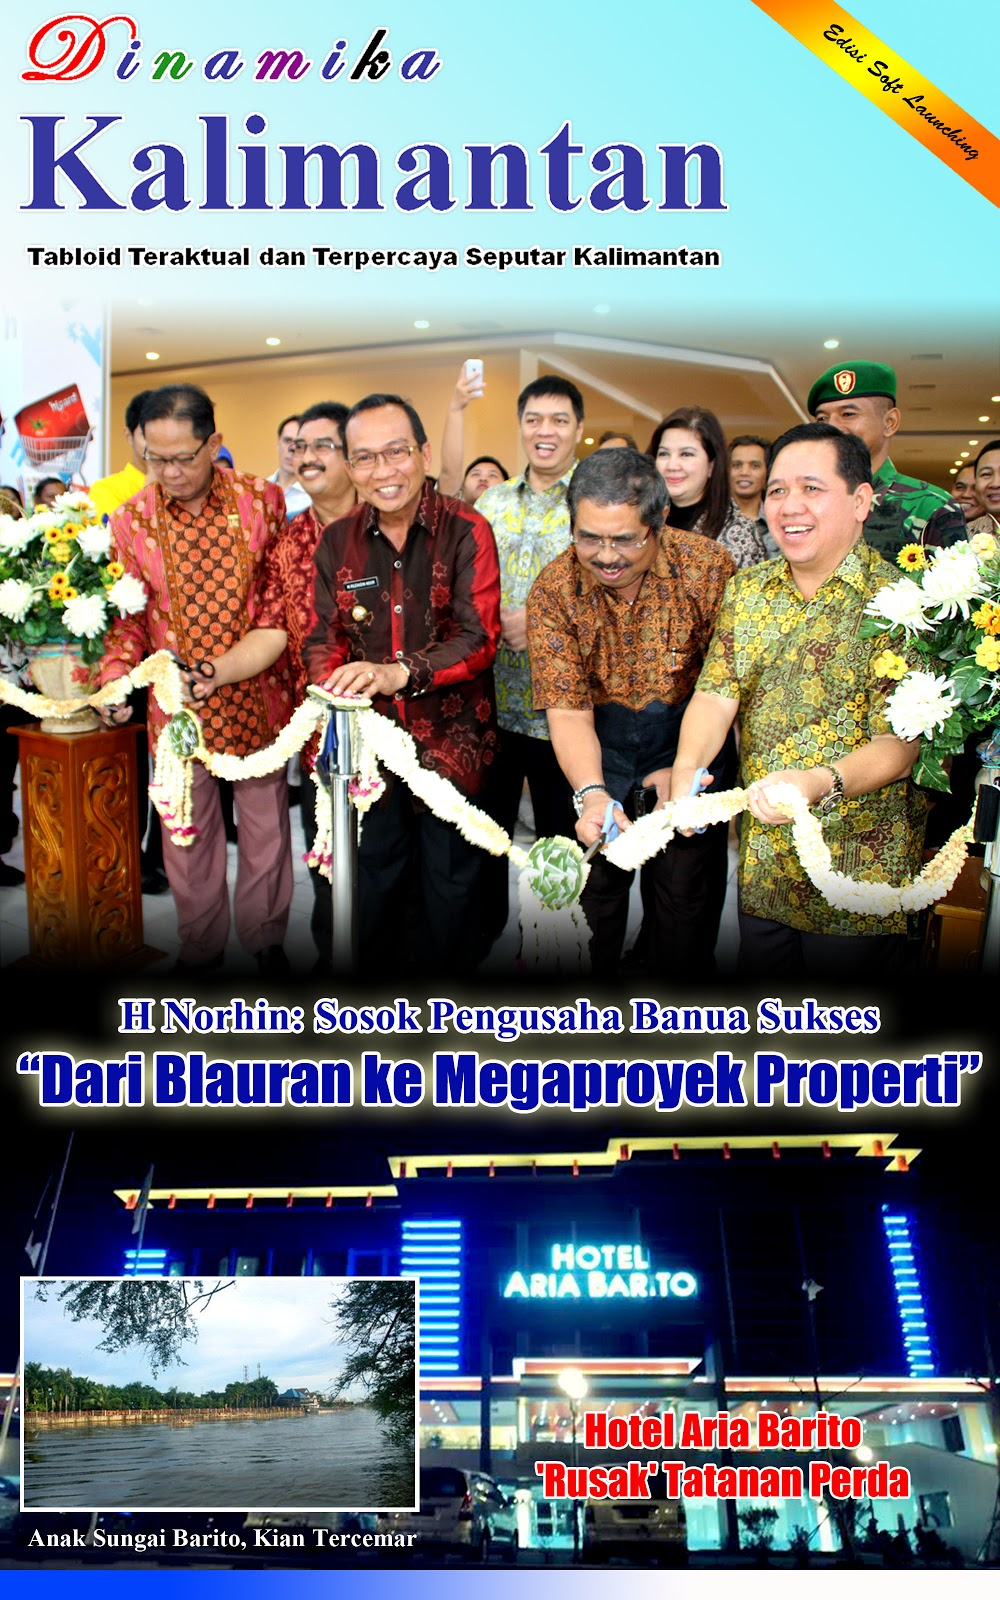 Epaper Dinamika Kalimantan Edisi 1 Nopember 2012